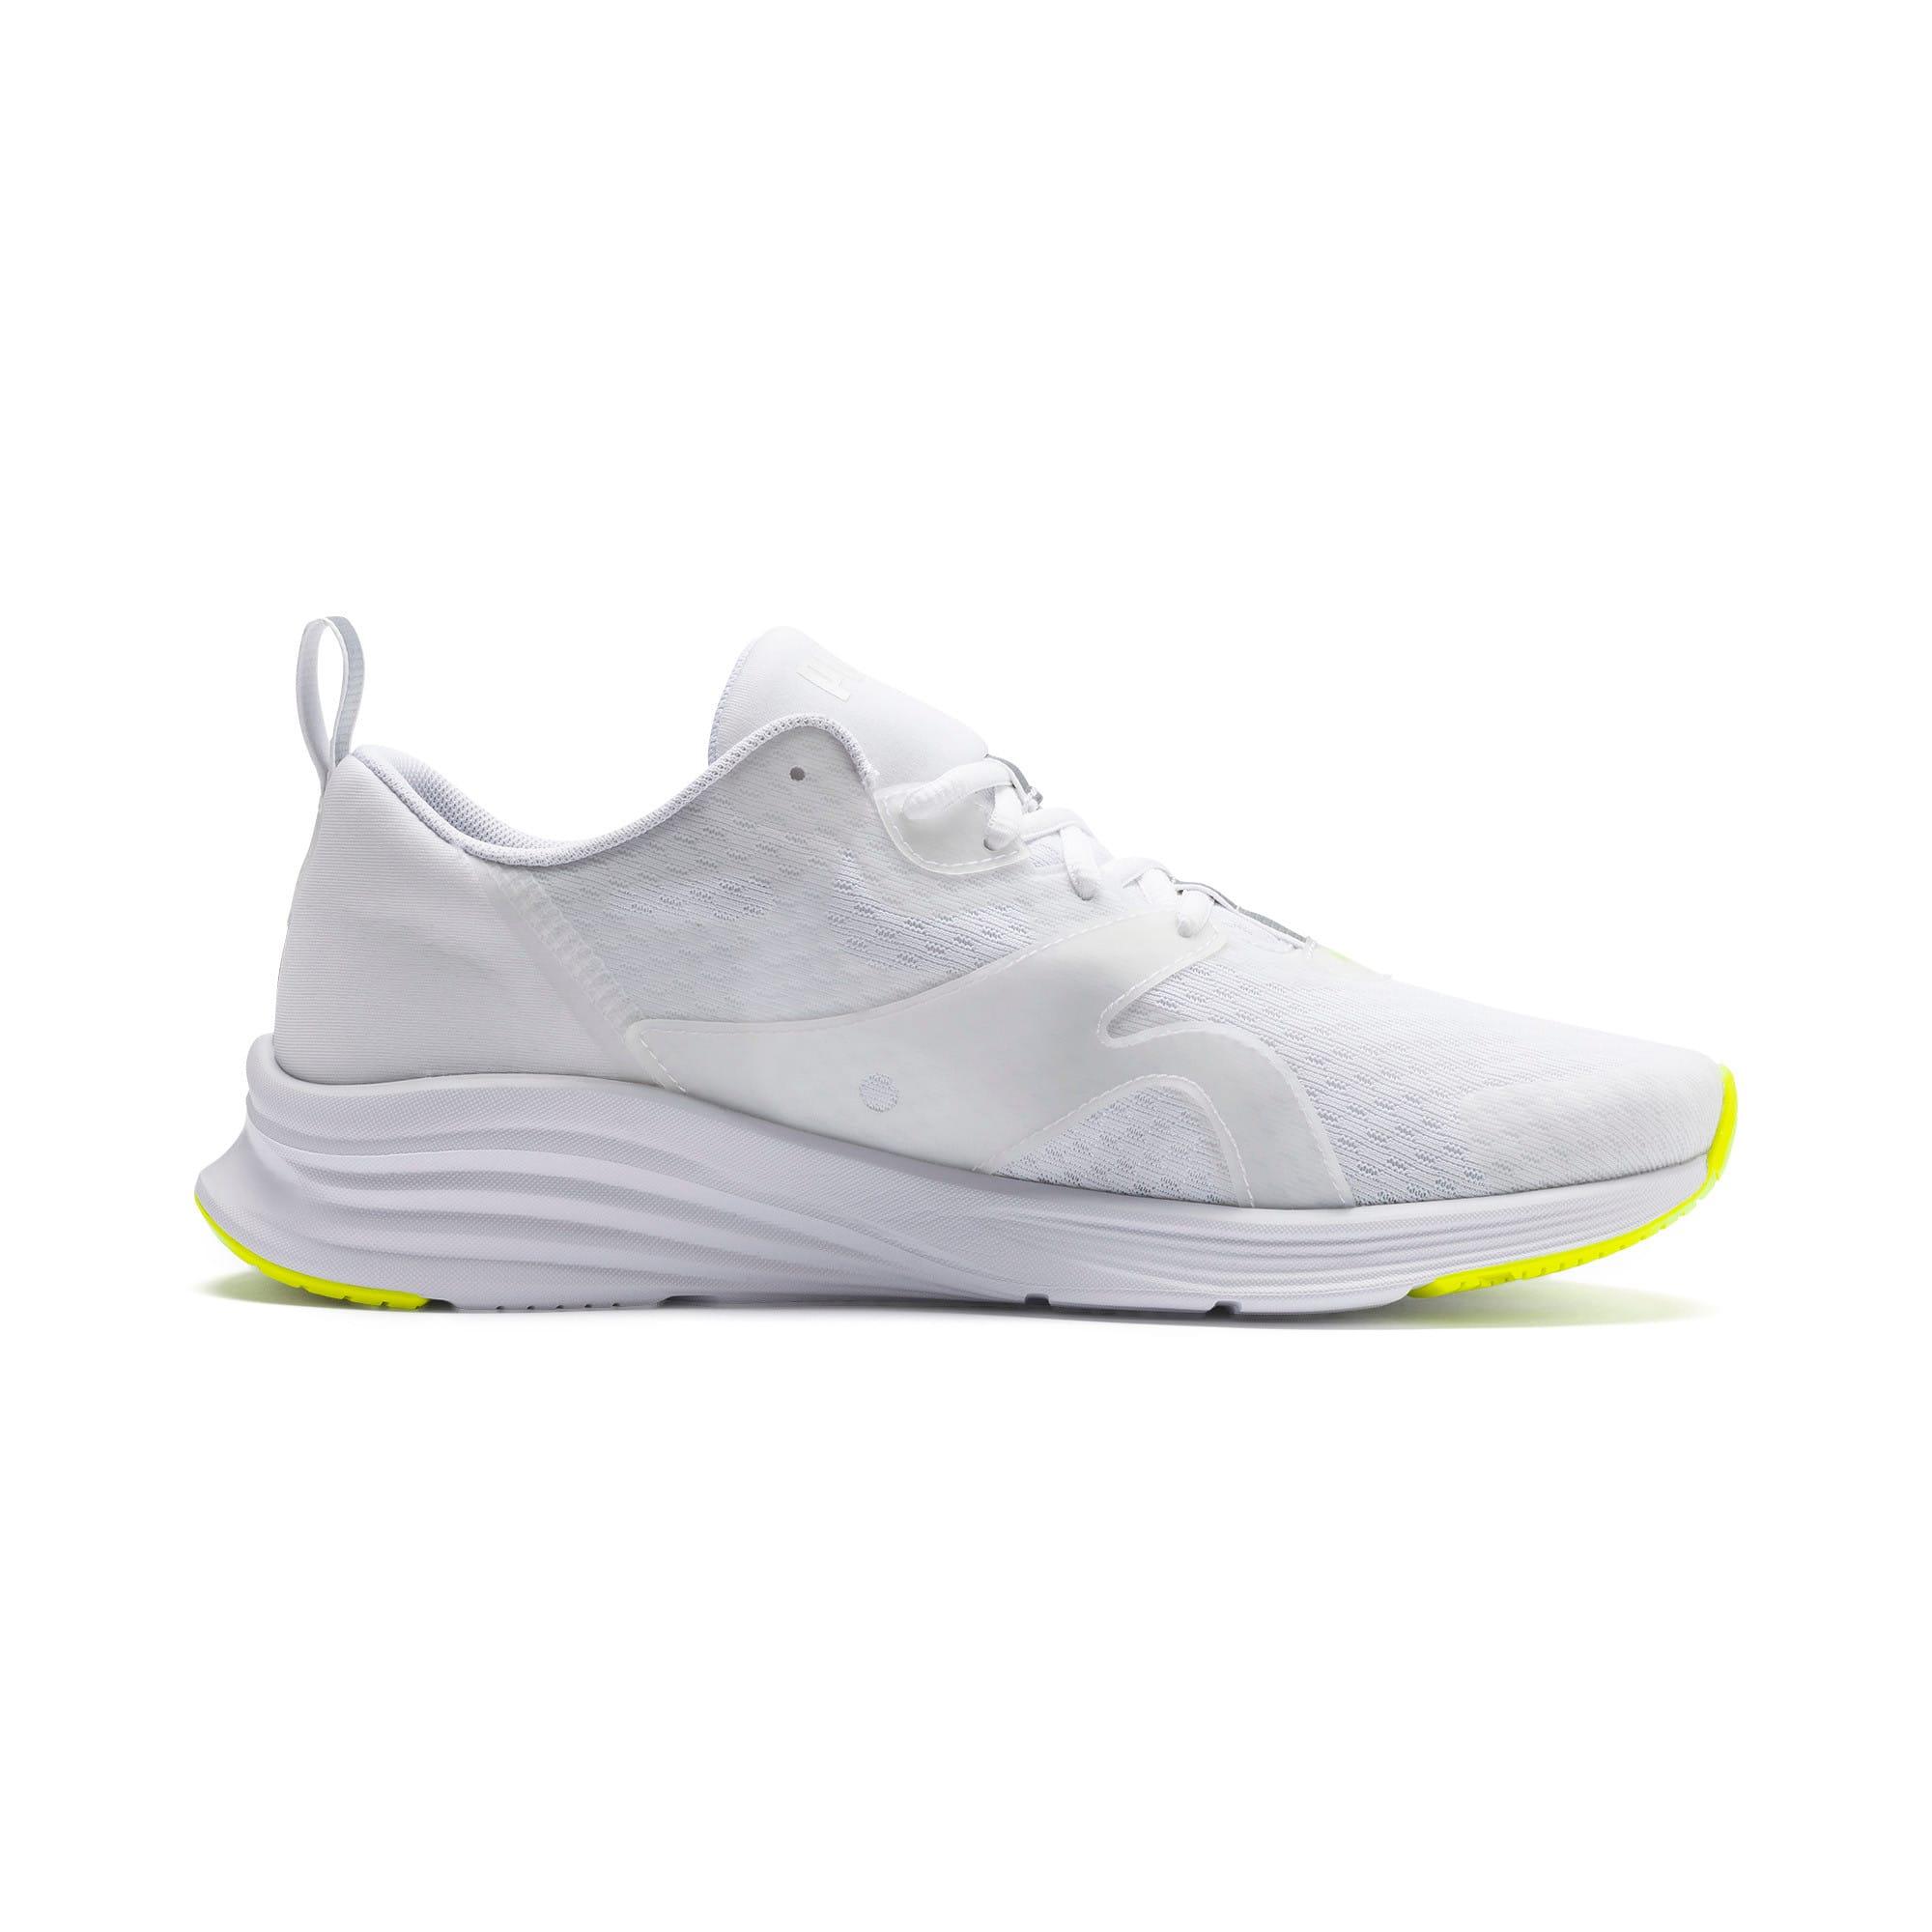 Thumbnail 6 of HYBRID Fuego Men's Running Shoes, Puma White-Yellow Alert, medium